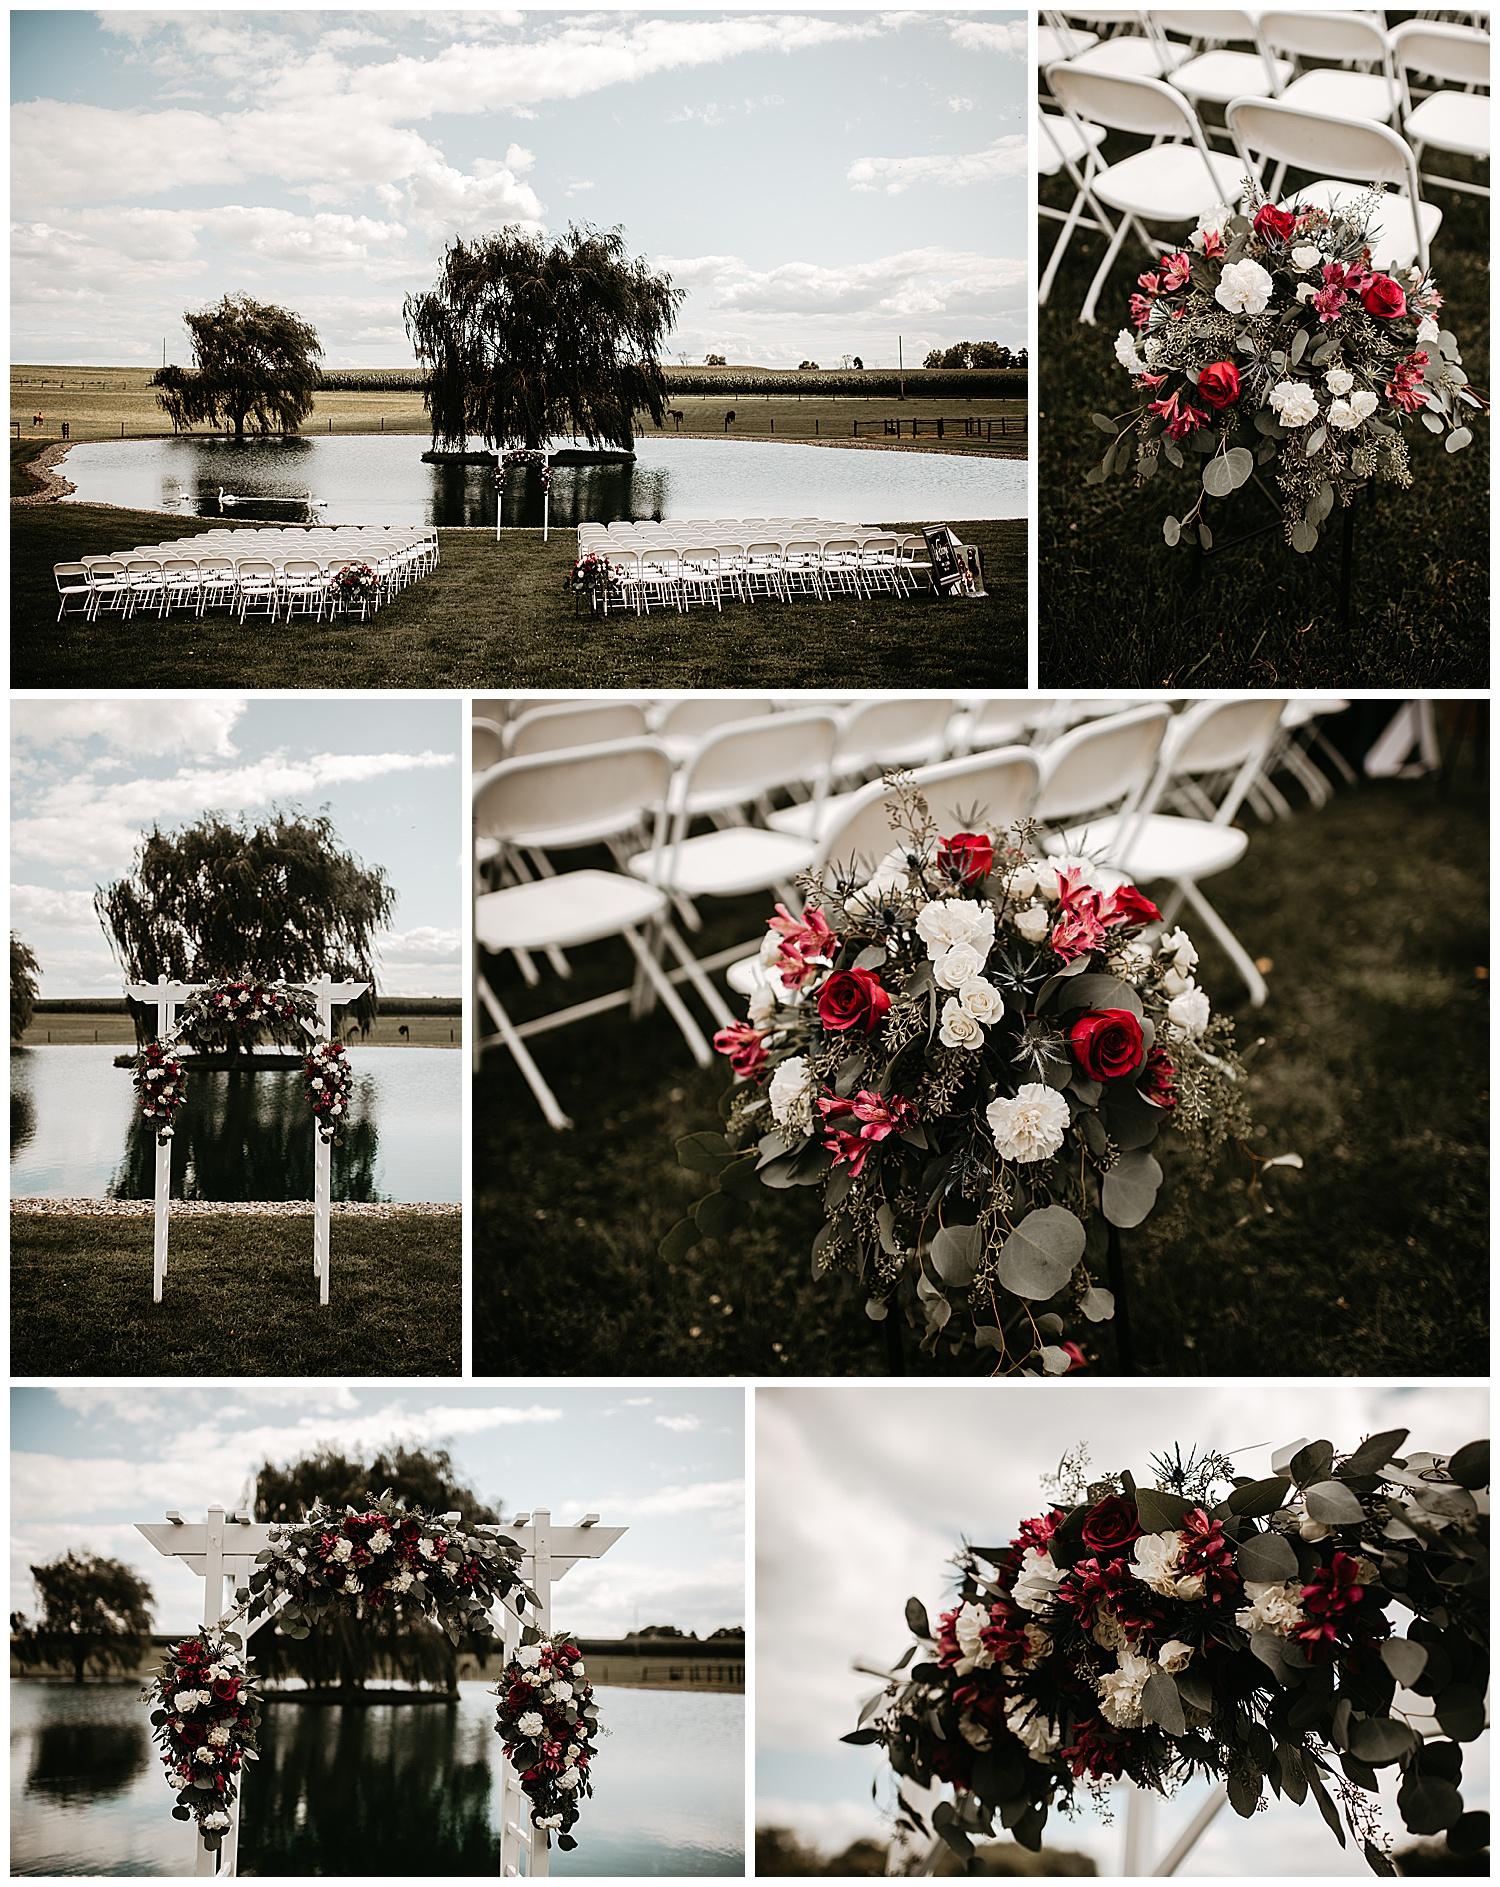 NEPA-Bloomgsburg-Wedding-Photographer-at-The-Barn-at-Greystone-Farms-Watsontown-PA_0054.jpg